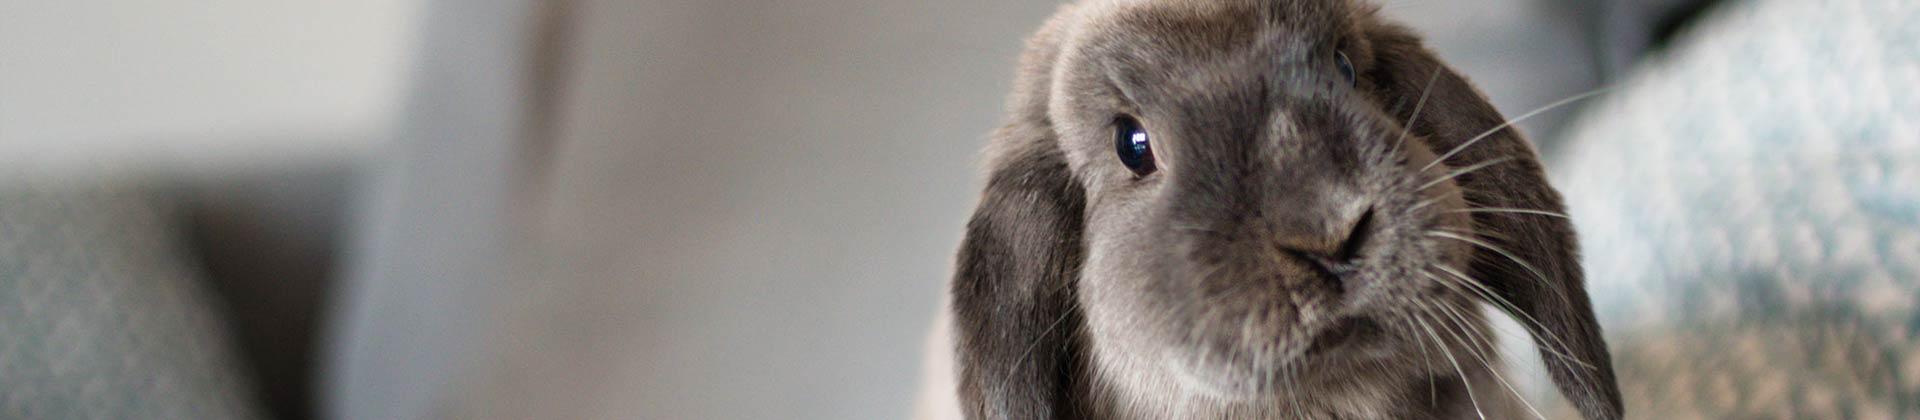 Kaninchenstall winterfest isoliert